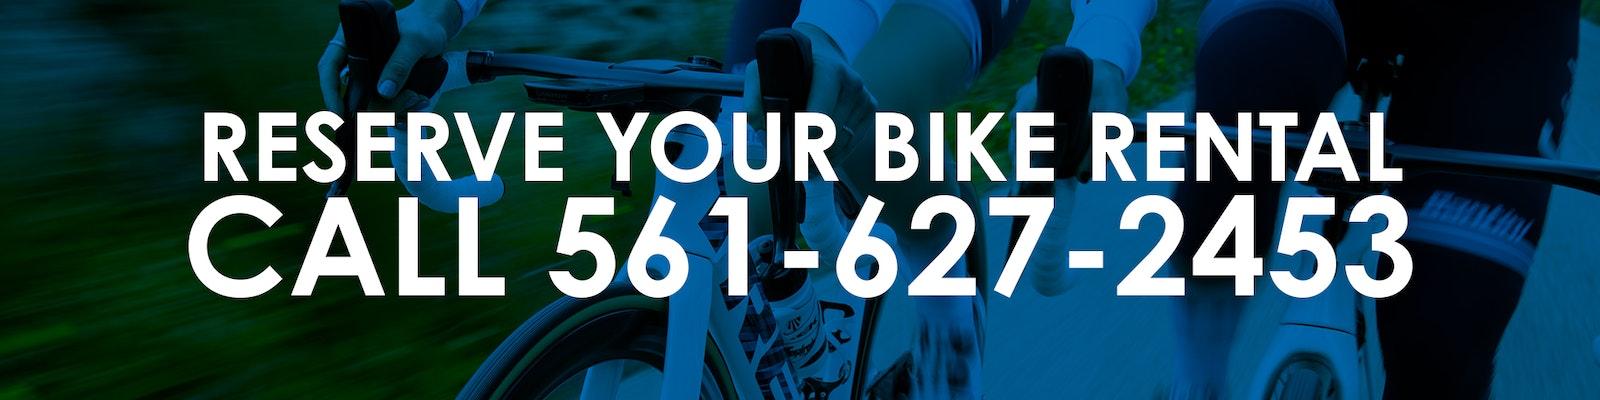 Reserve your bike rental. Call 561-627-2453